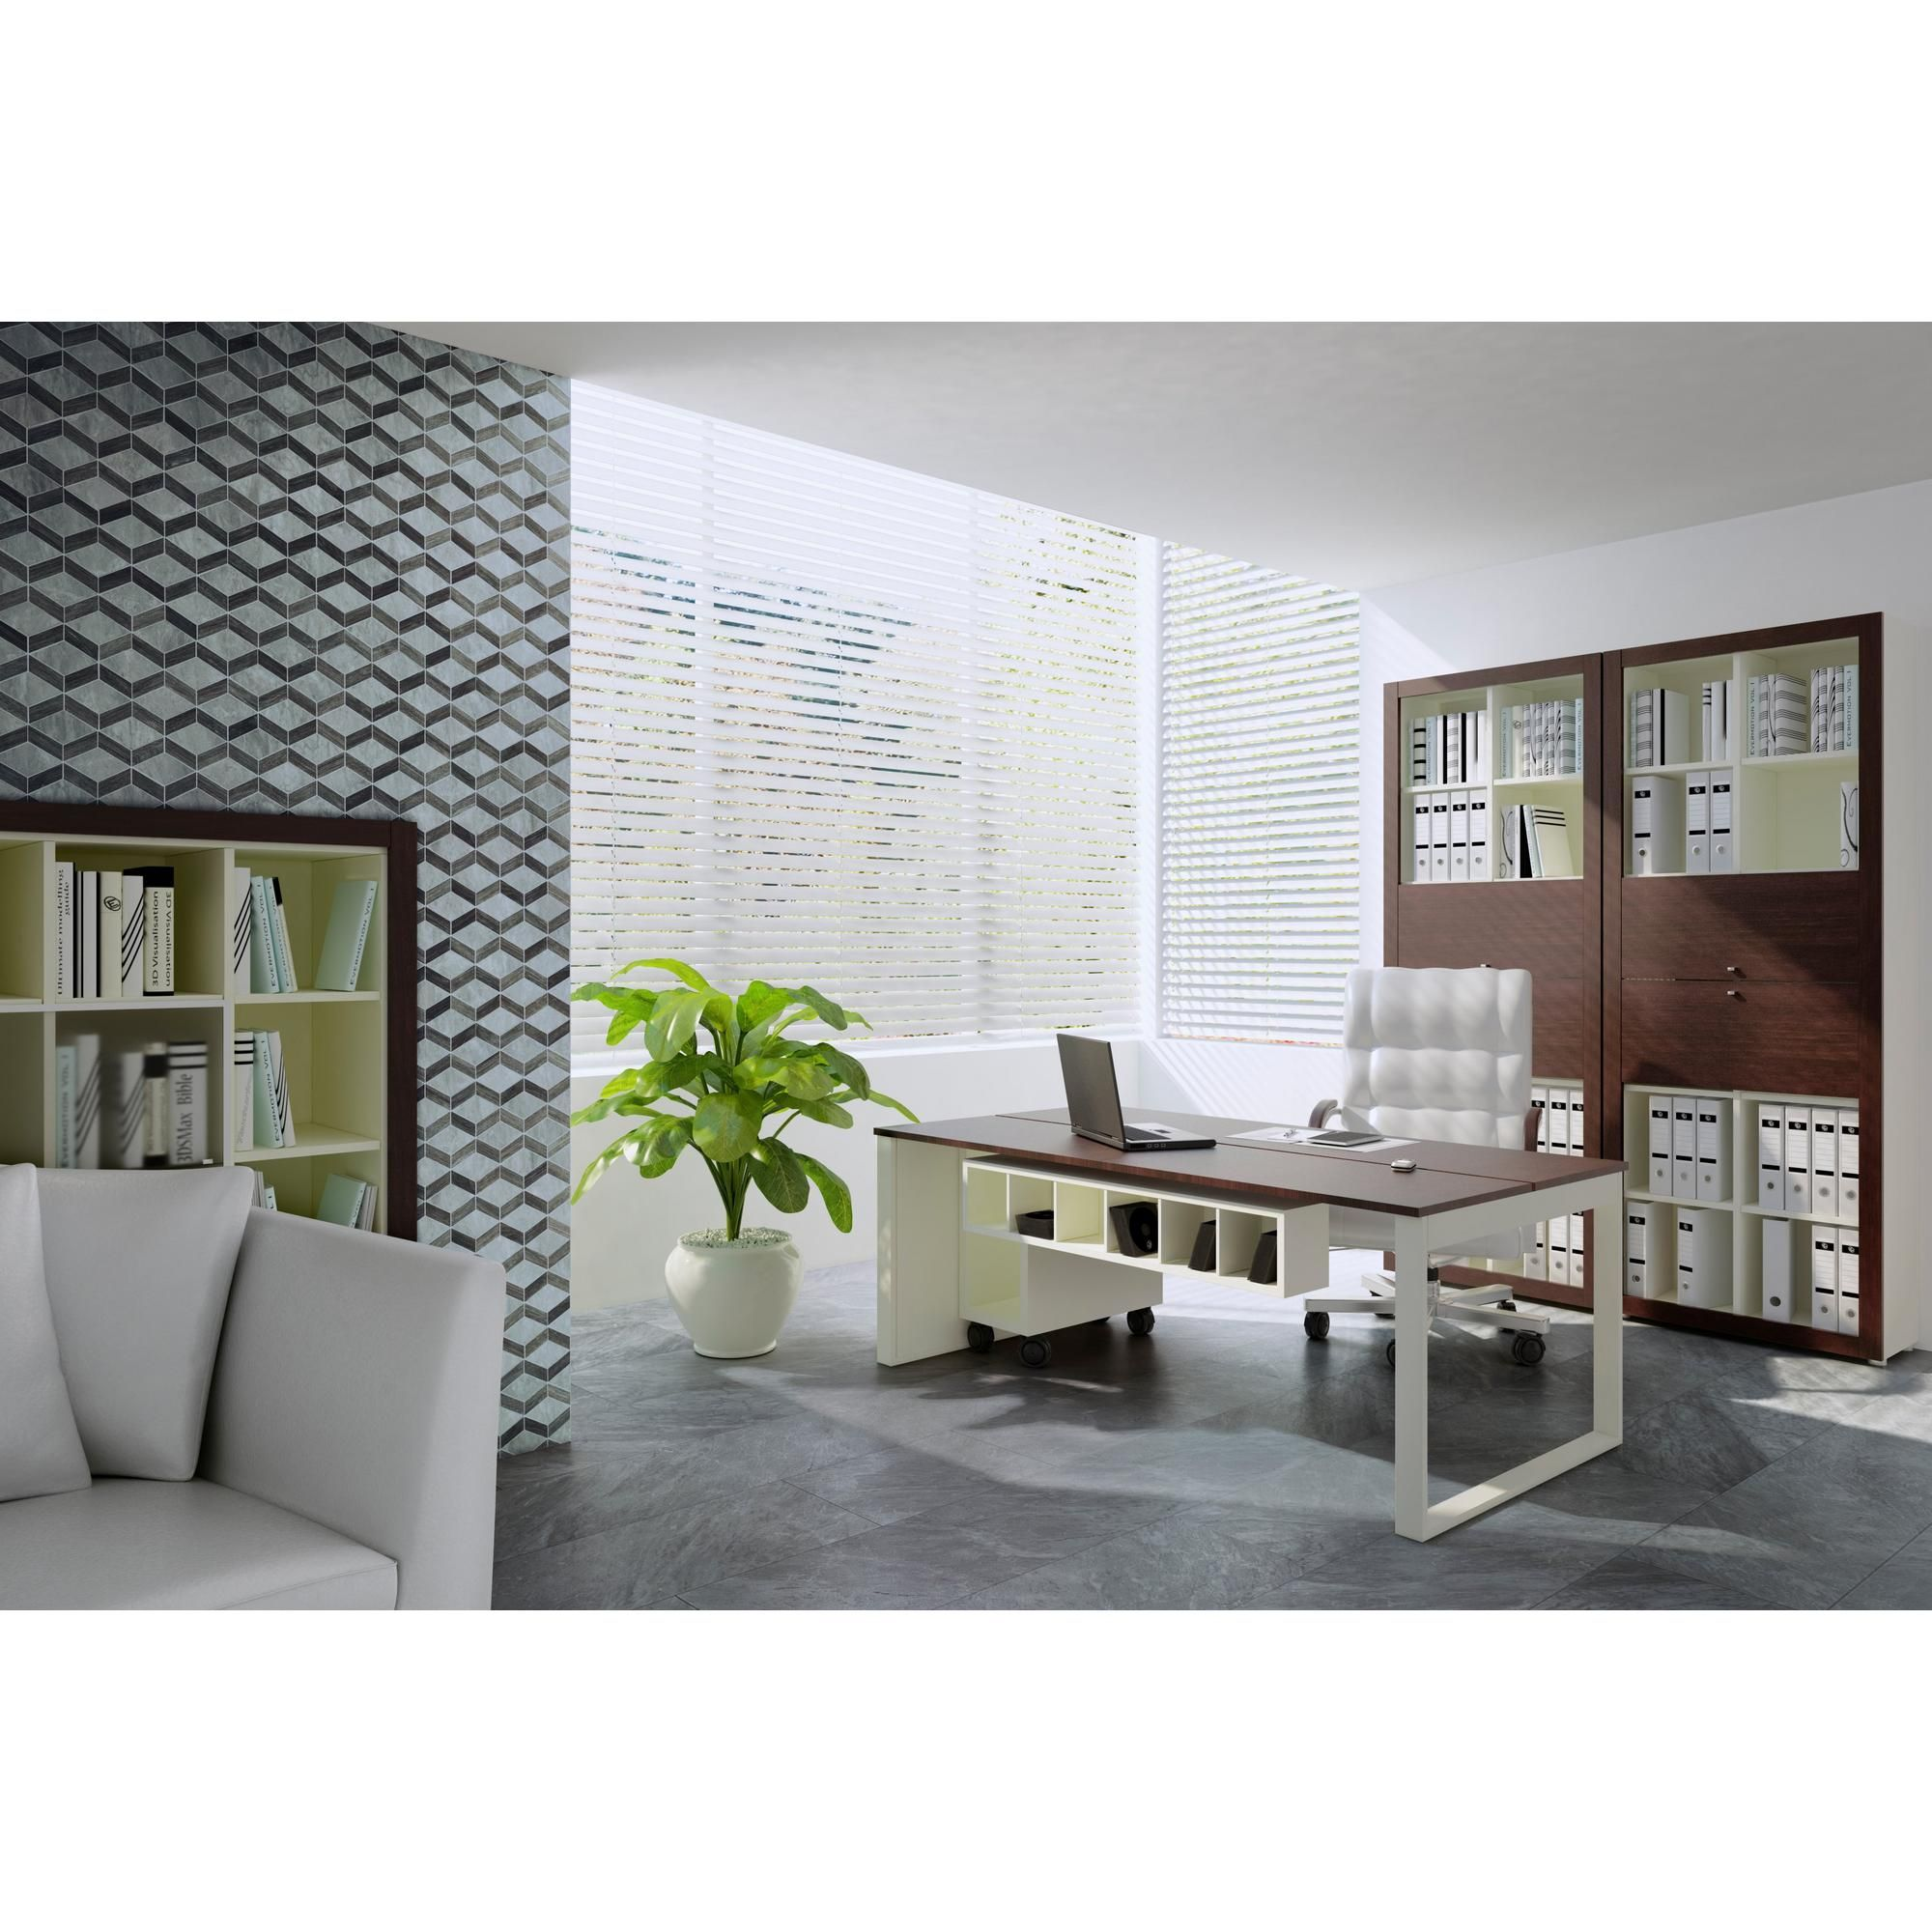 Carrara Blue Porcelain Tile Floor & Decor Interior